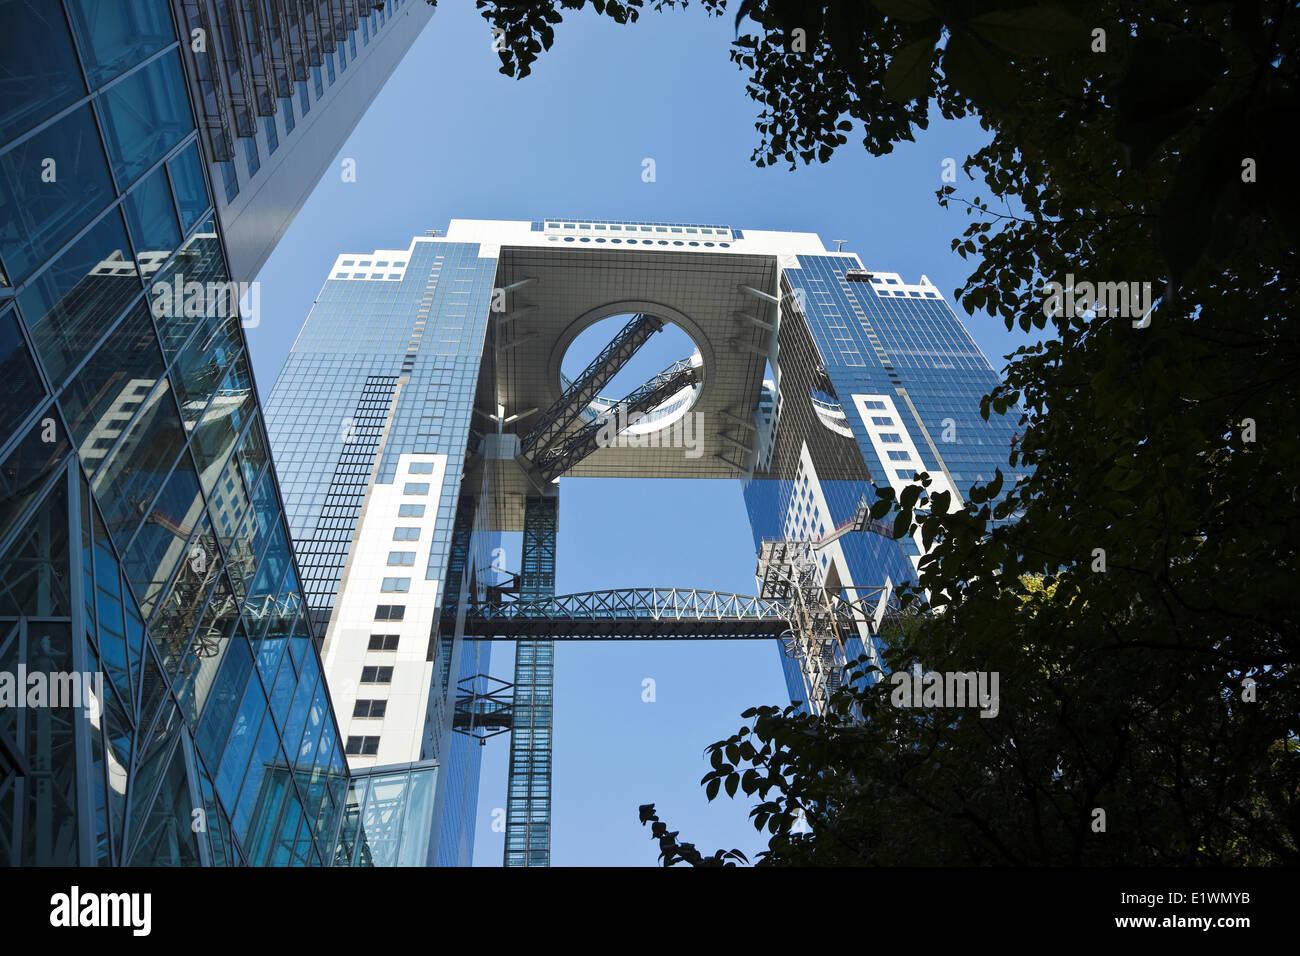 One of Osaka's most recognizable landmarks, the Umeda Sky Building, Osaka, Japan - Stock Image